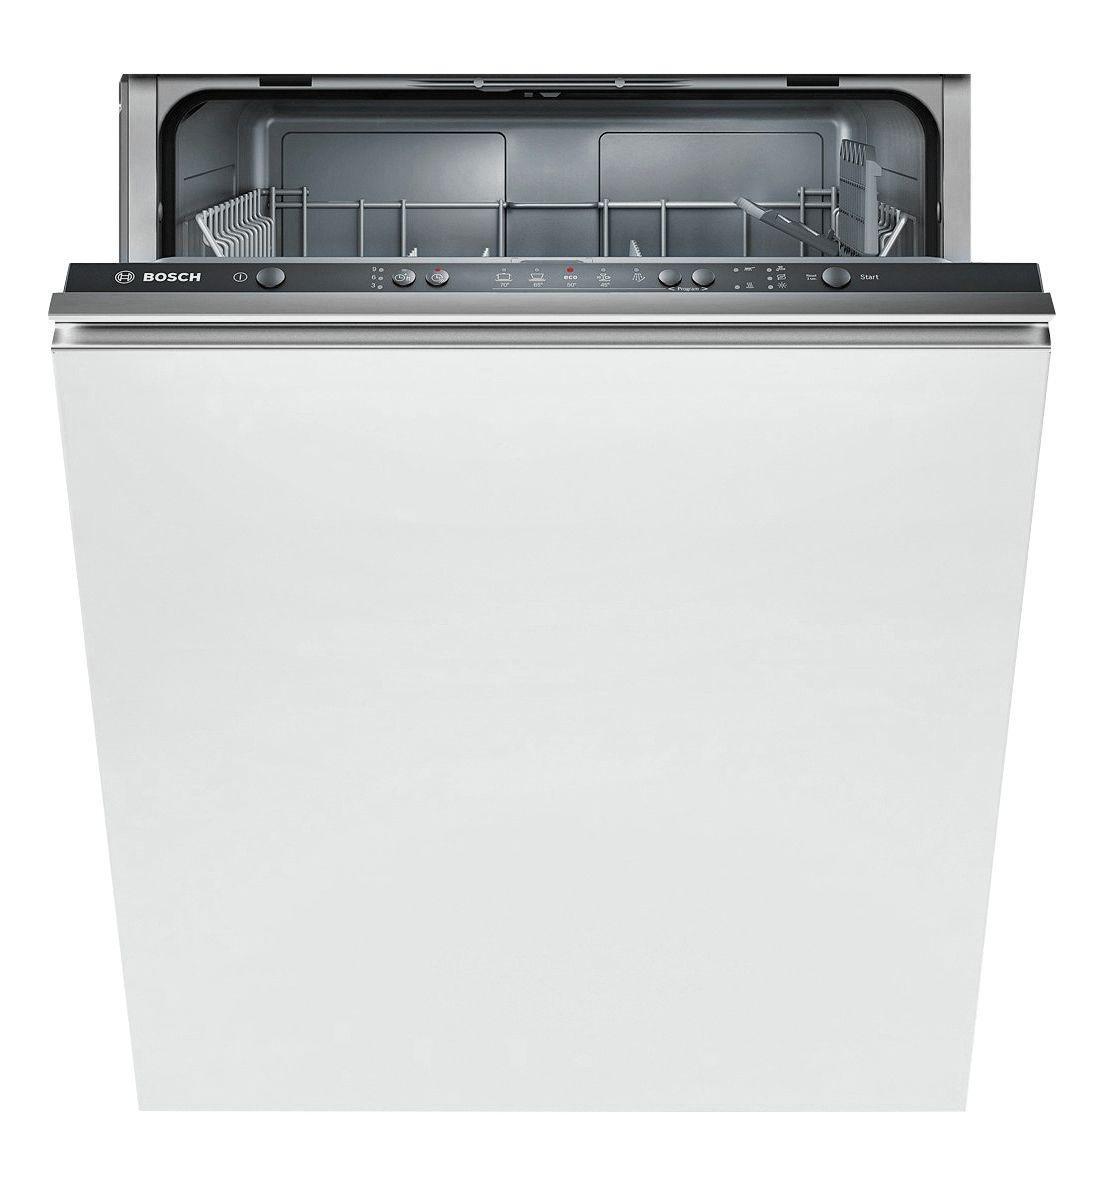 best bosch built in dishwashers 2017 our top 5 best prices. Black Bedroom Furniture Sets. Home Design Ideas